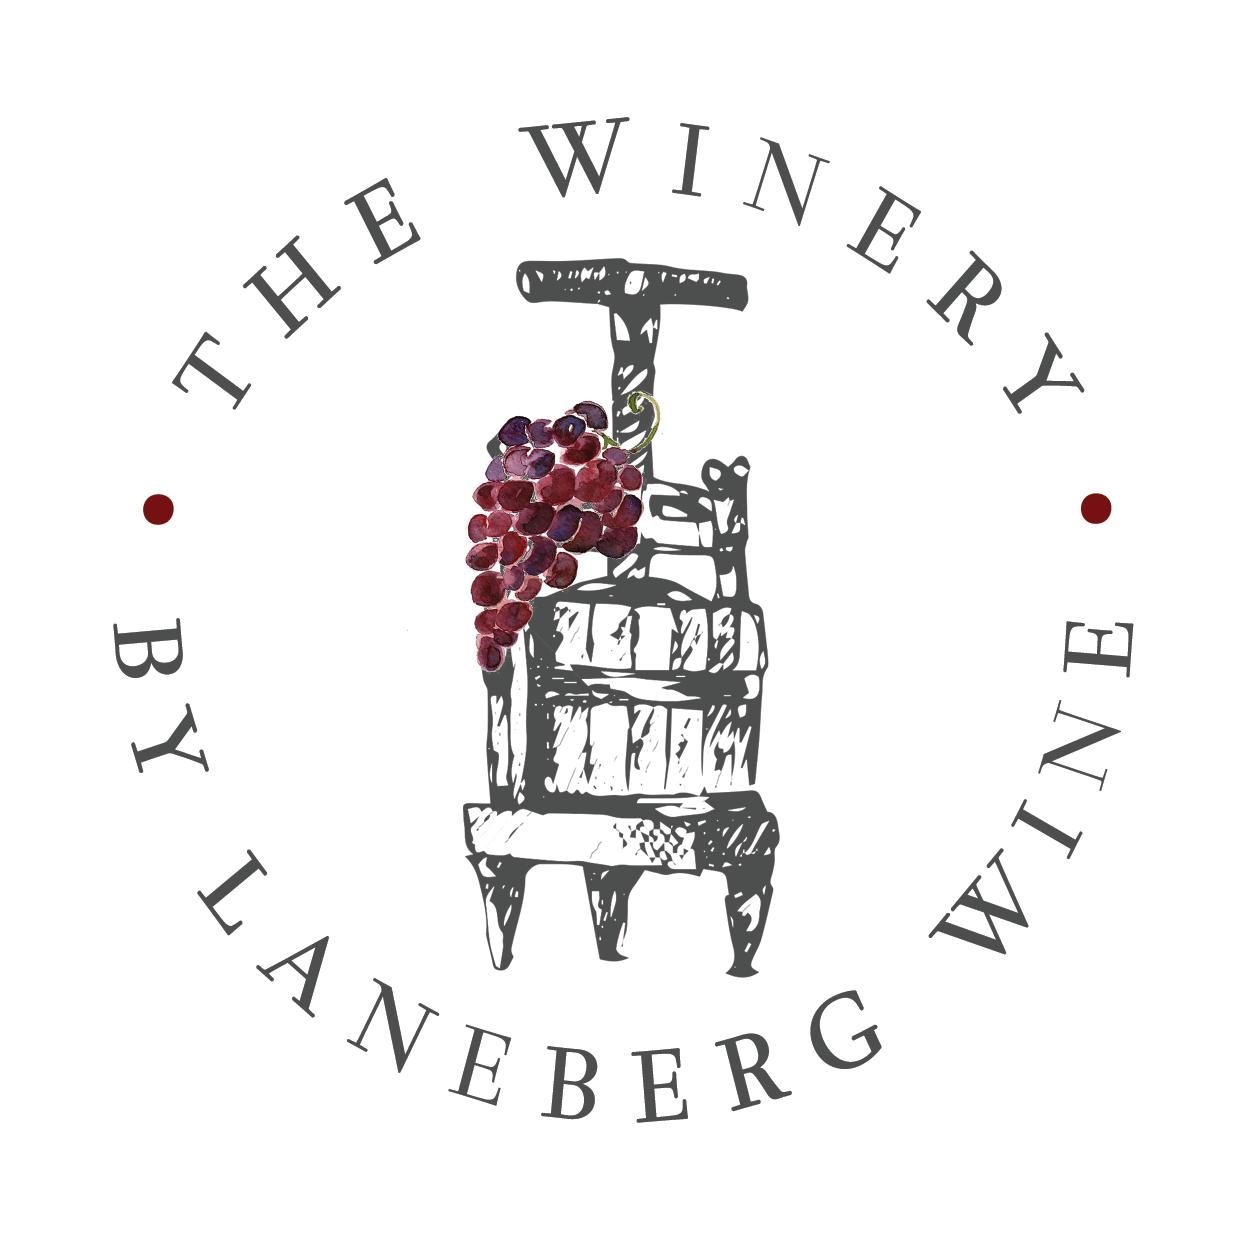 Laneberg Wine Image